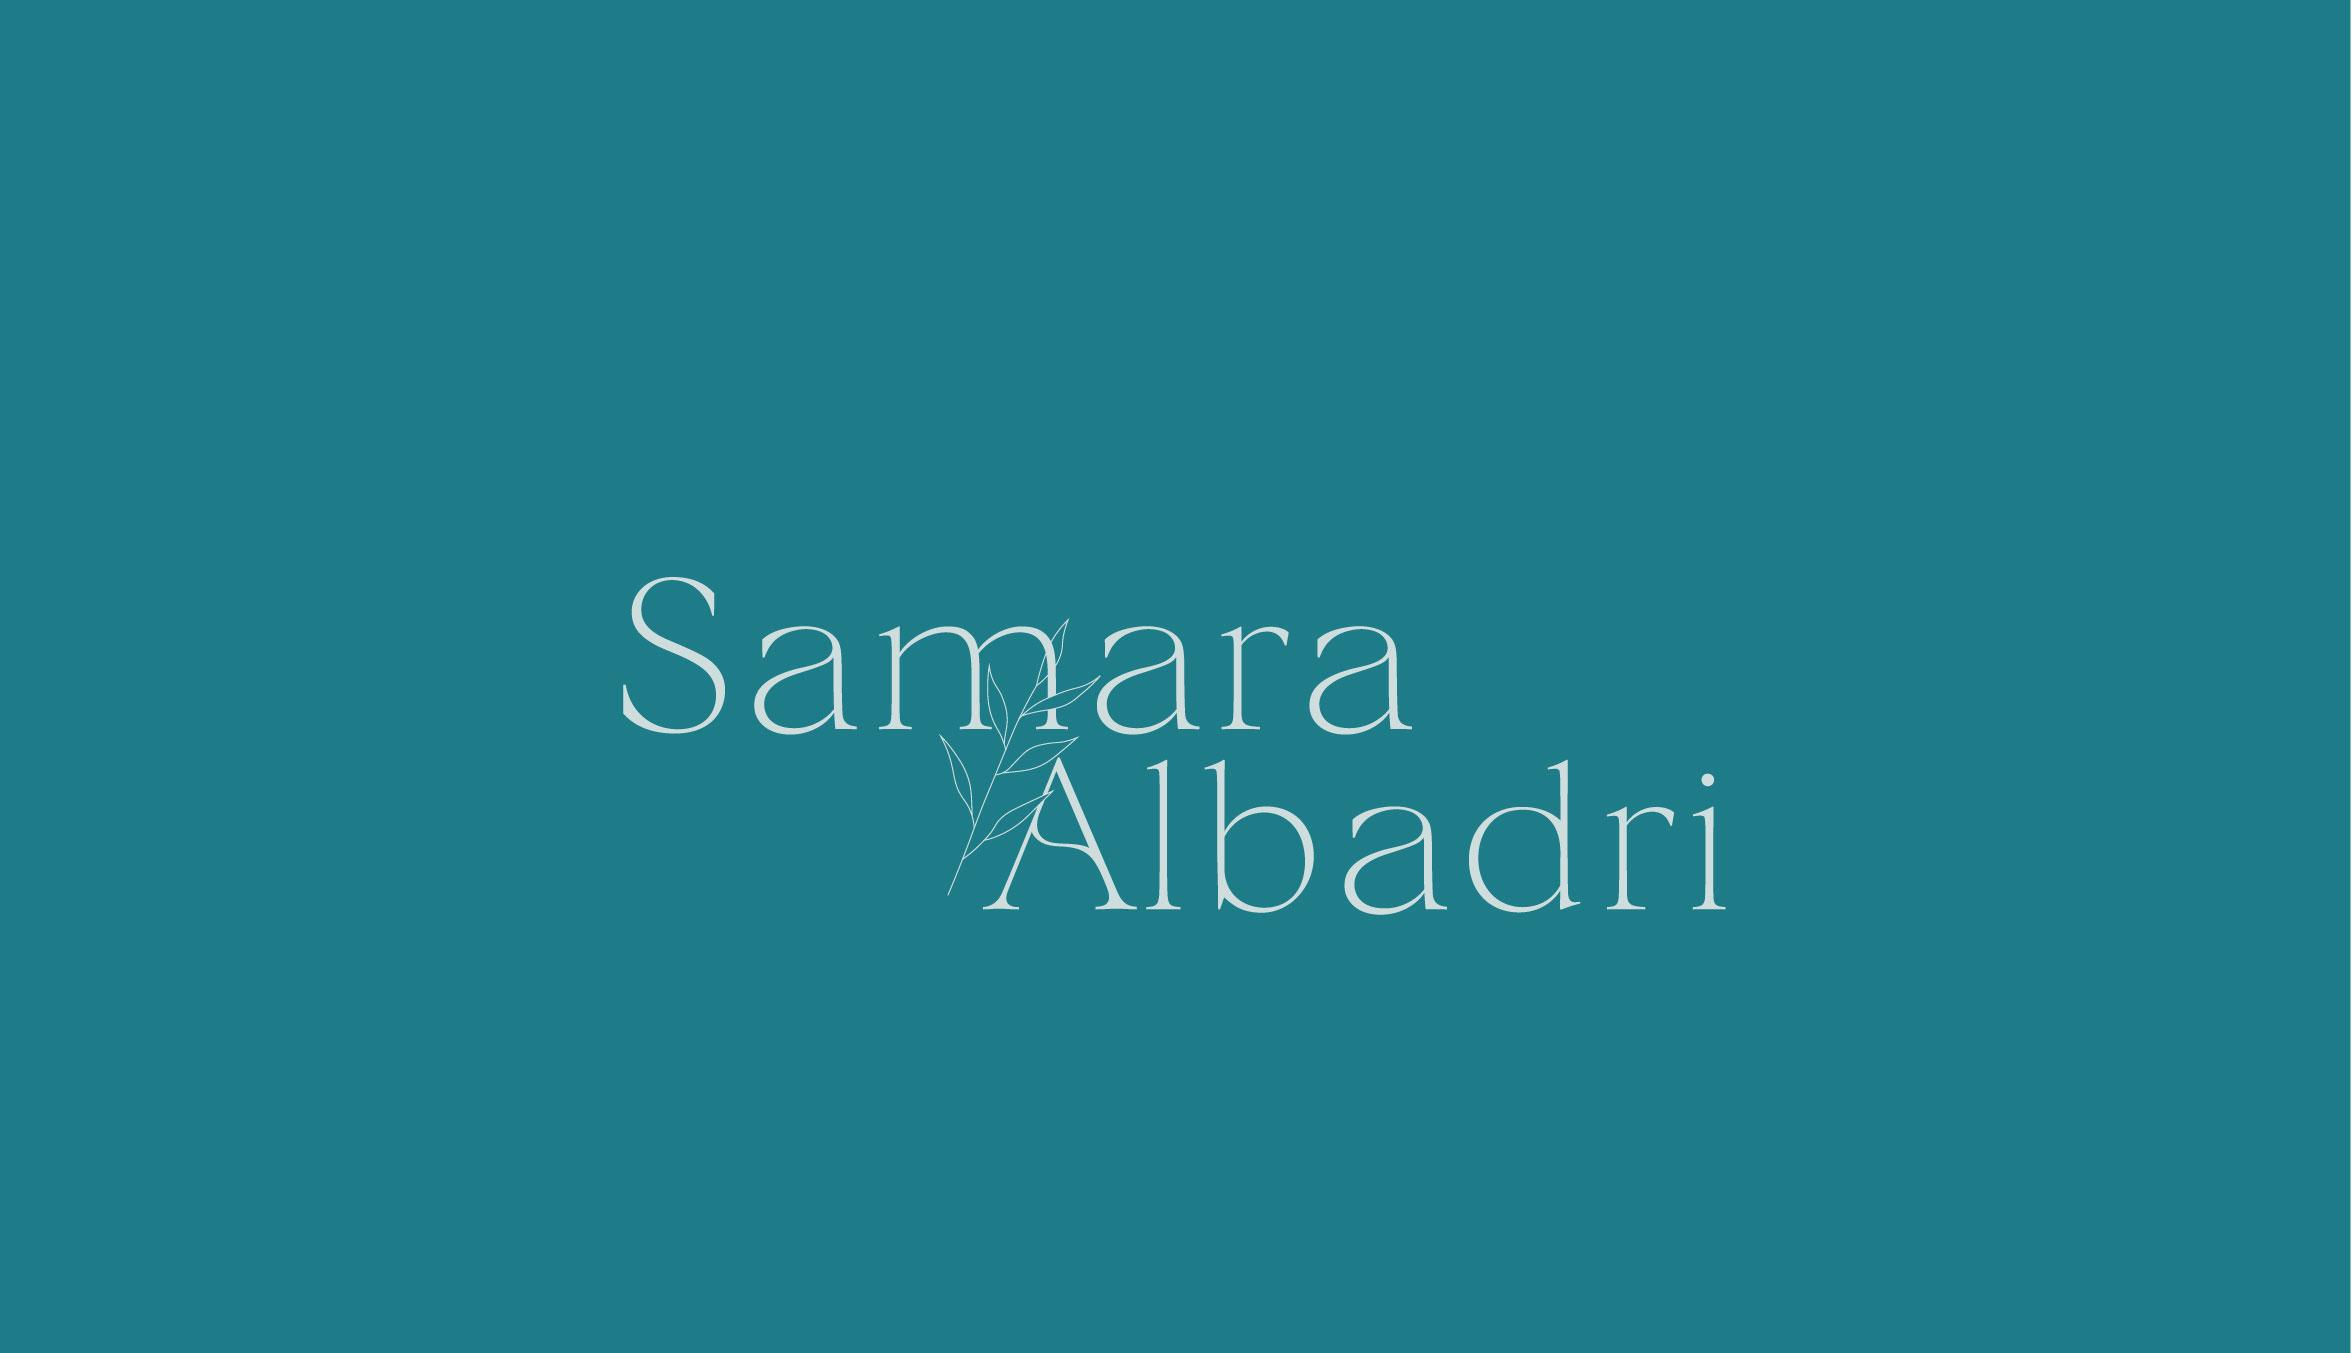 SamaraAlbadri_BrandBoard-07.jpg